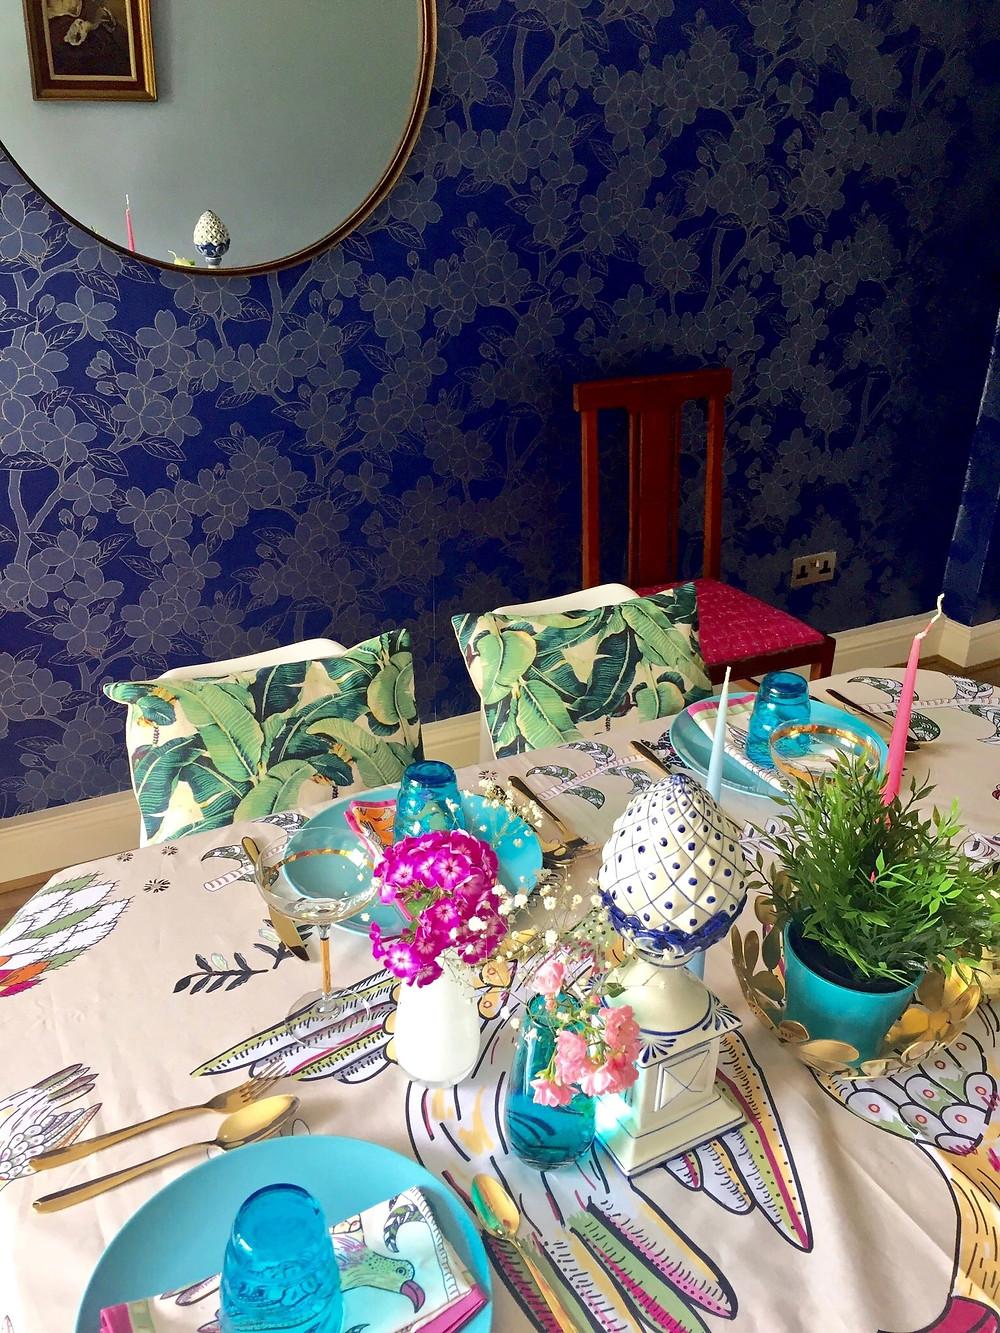 Camelia wallpaper Little Greene, banana leaf cushion, Flos wall light, round mirror, dining room, table setting